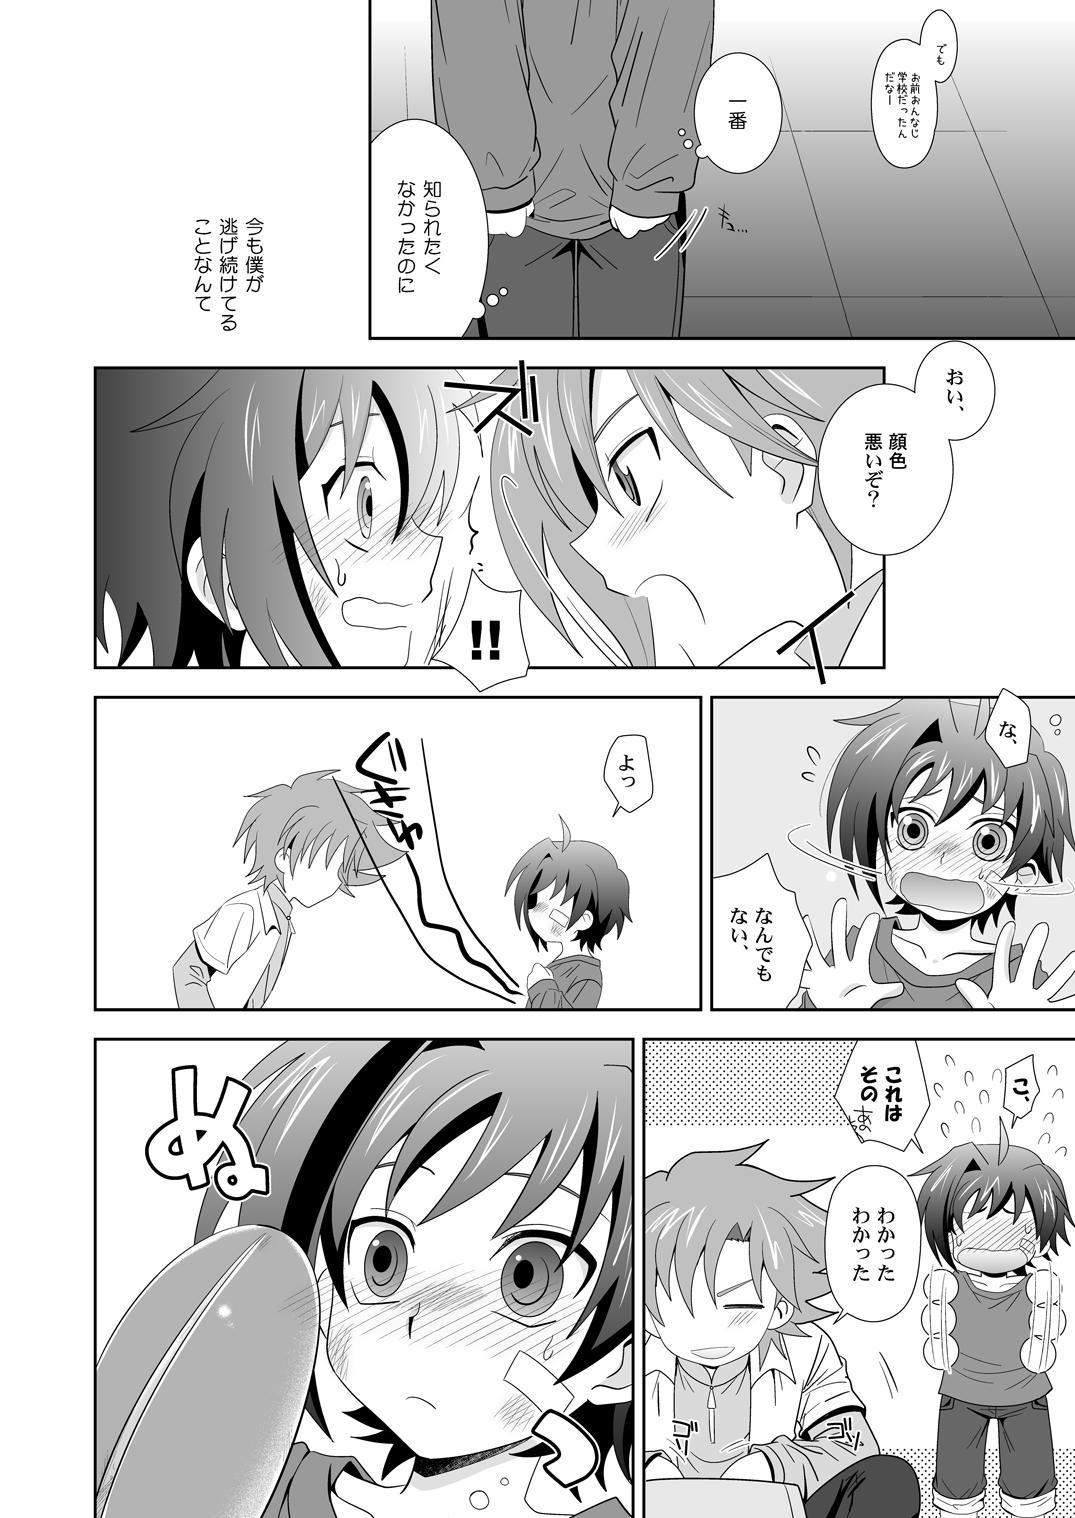 Yuuyake to Coppepan 2